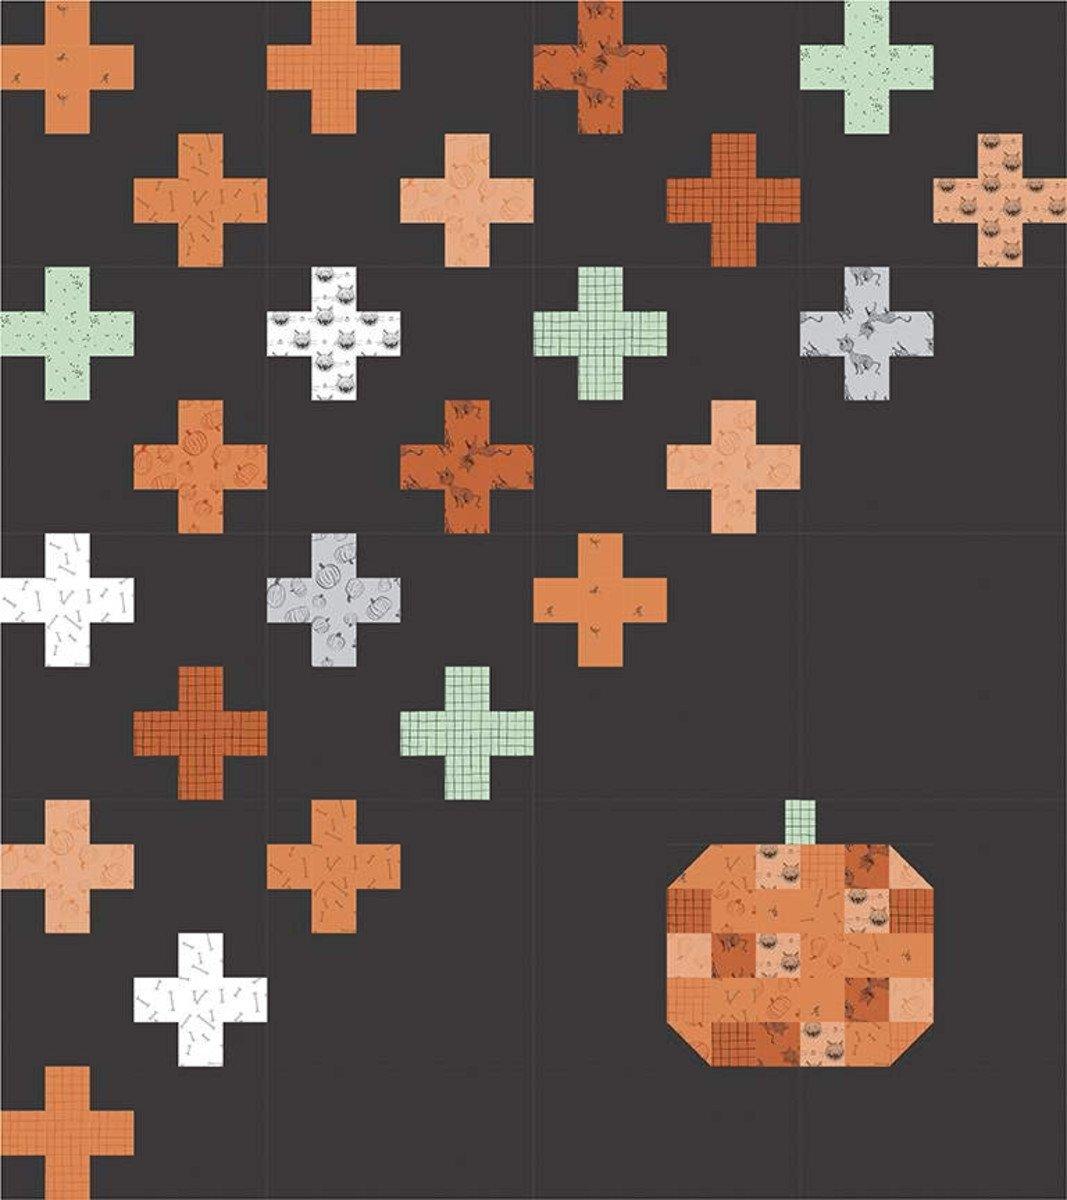 Swiss Fall Bliss Quilt Pattern (72x81)